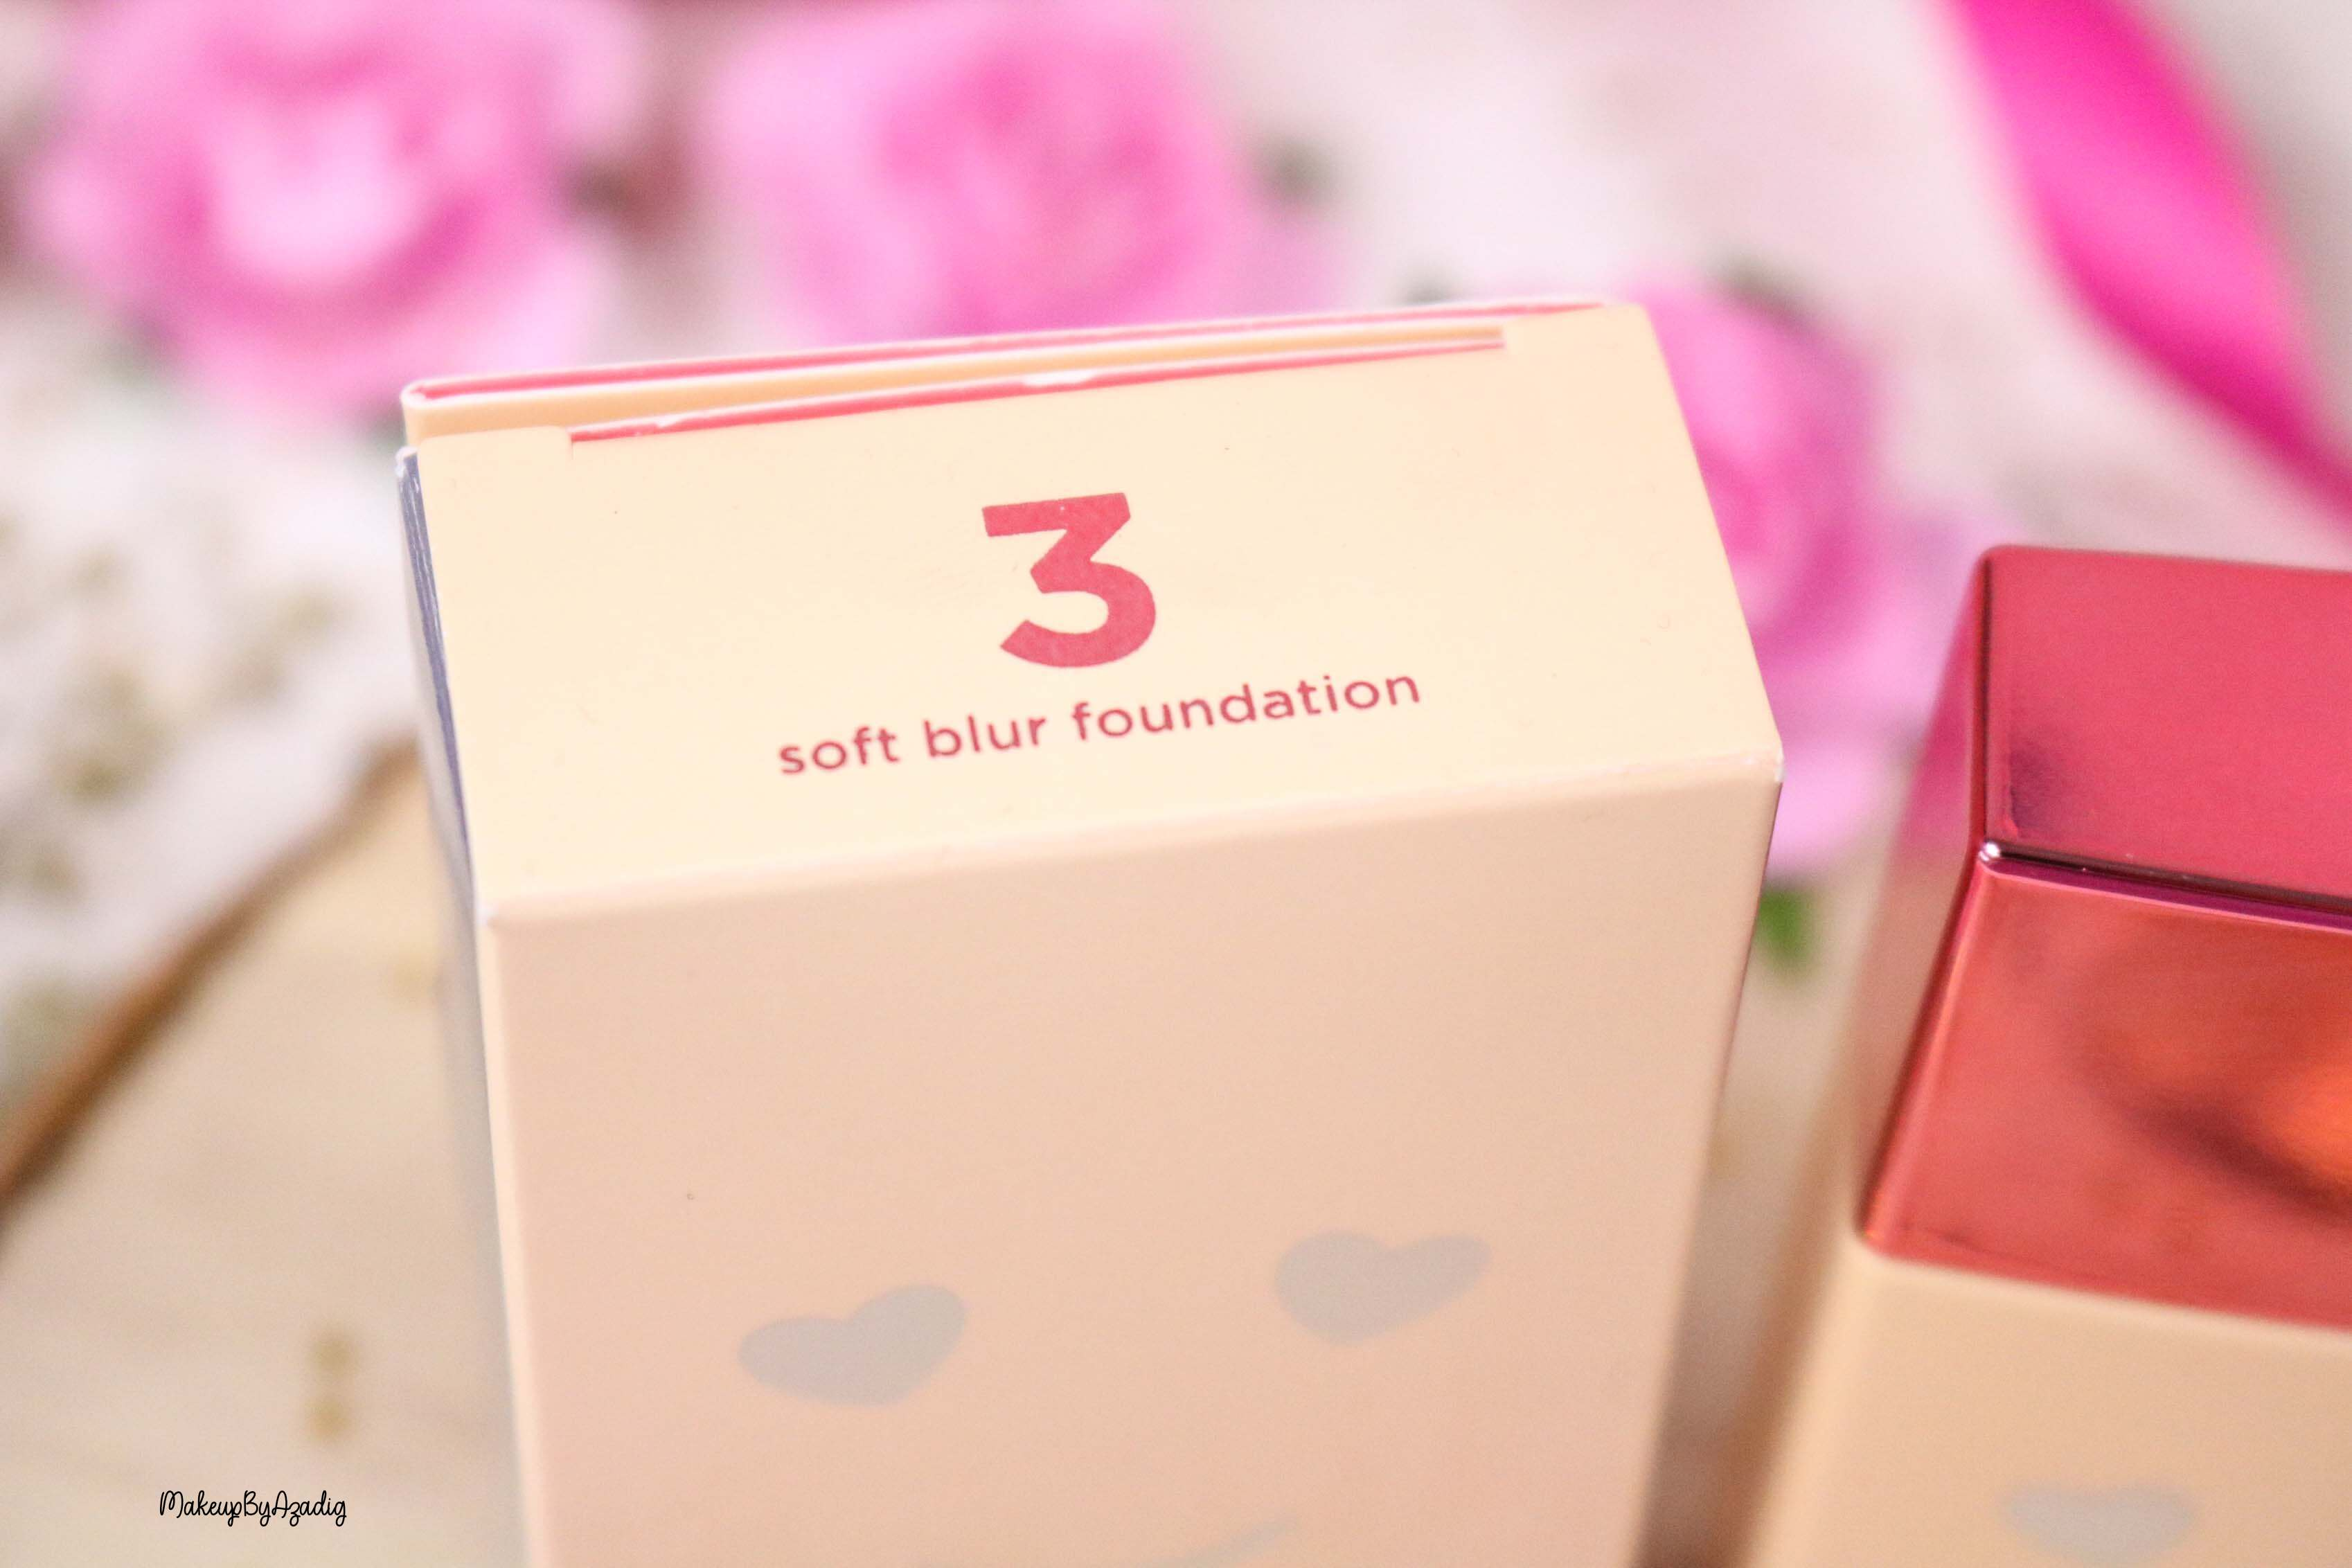 revue-nouveau-fond-de-teint-hello-happy-benefit-sephora-prix-avis-teintes-makeupbyazadig-peau-claire